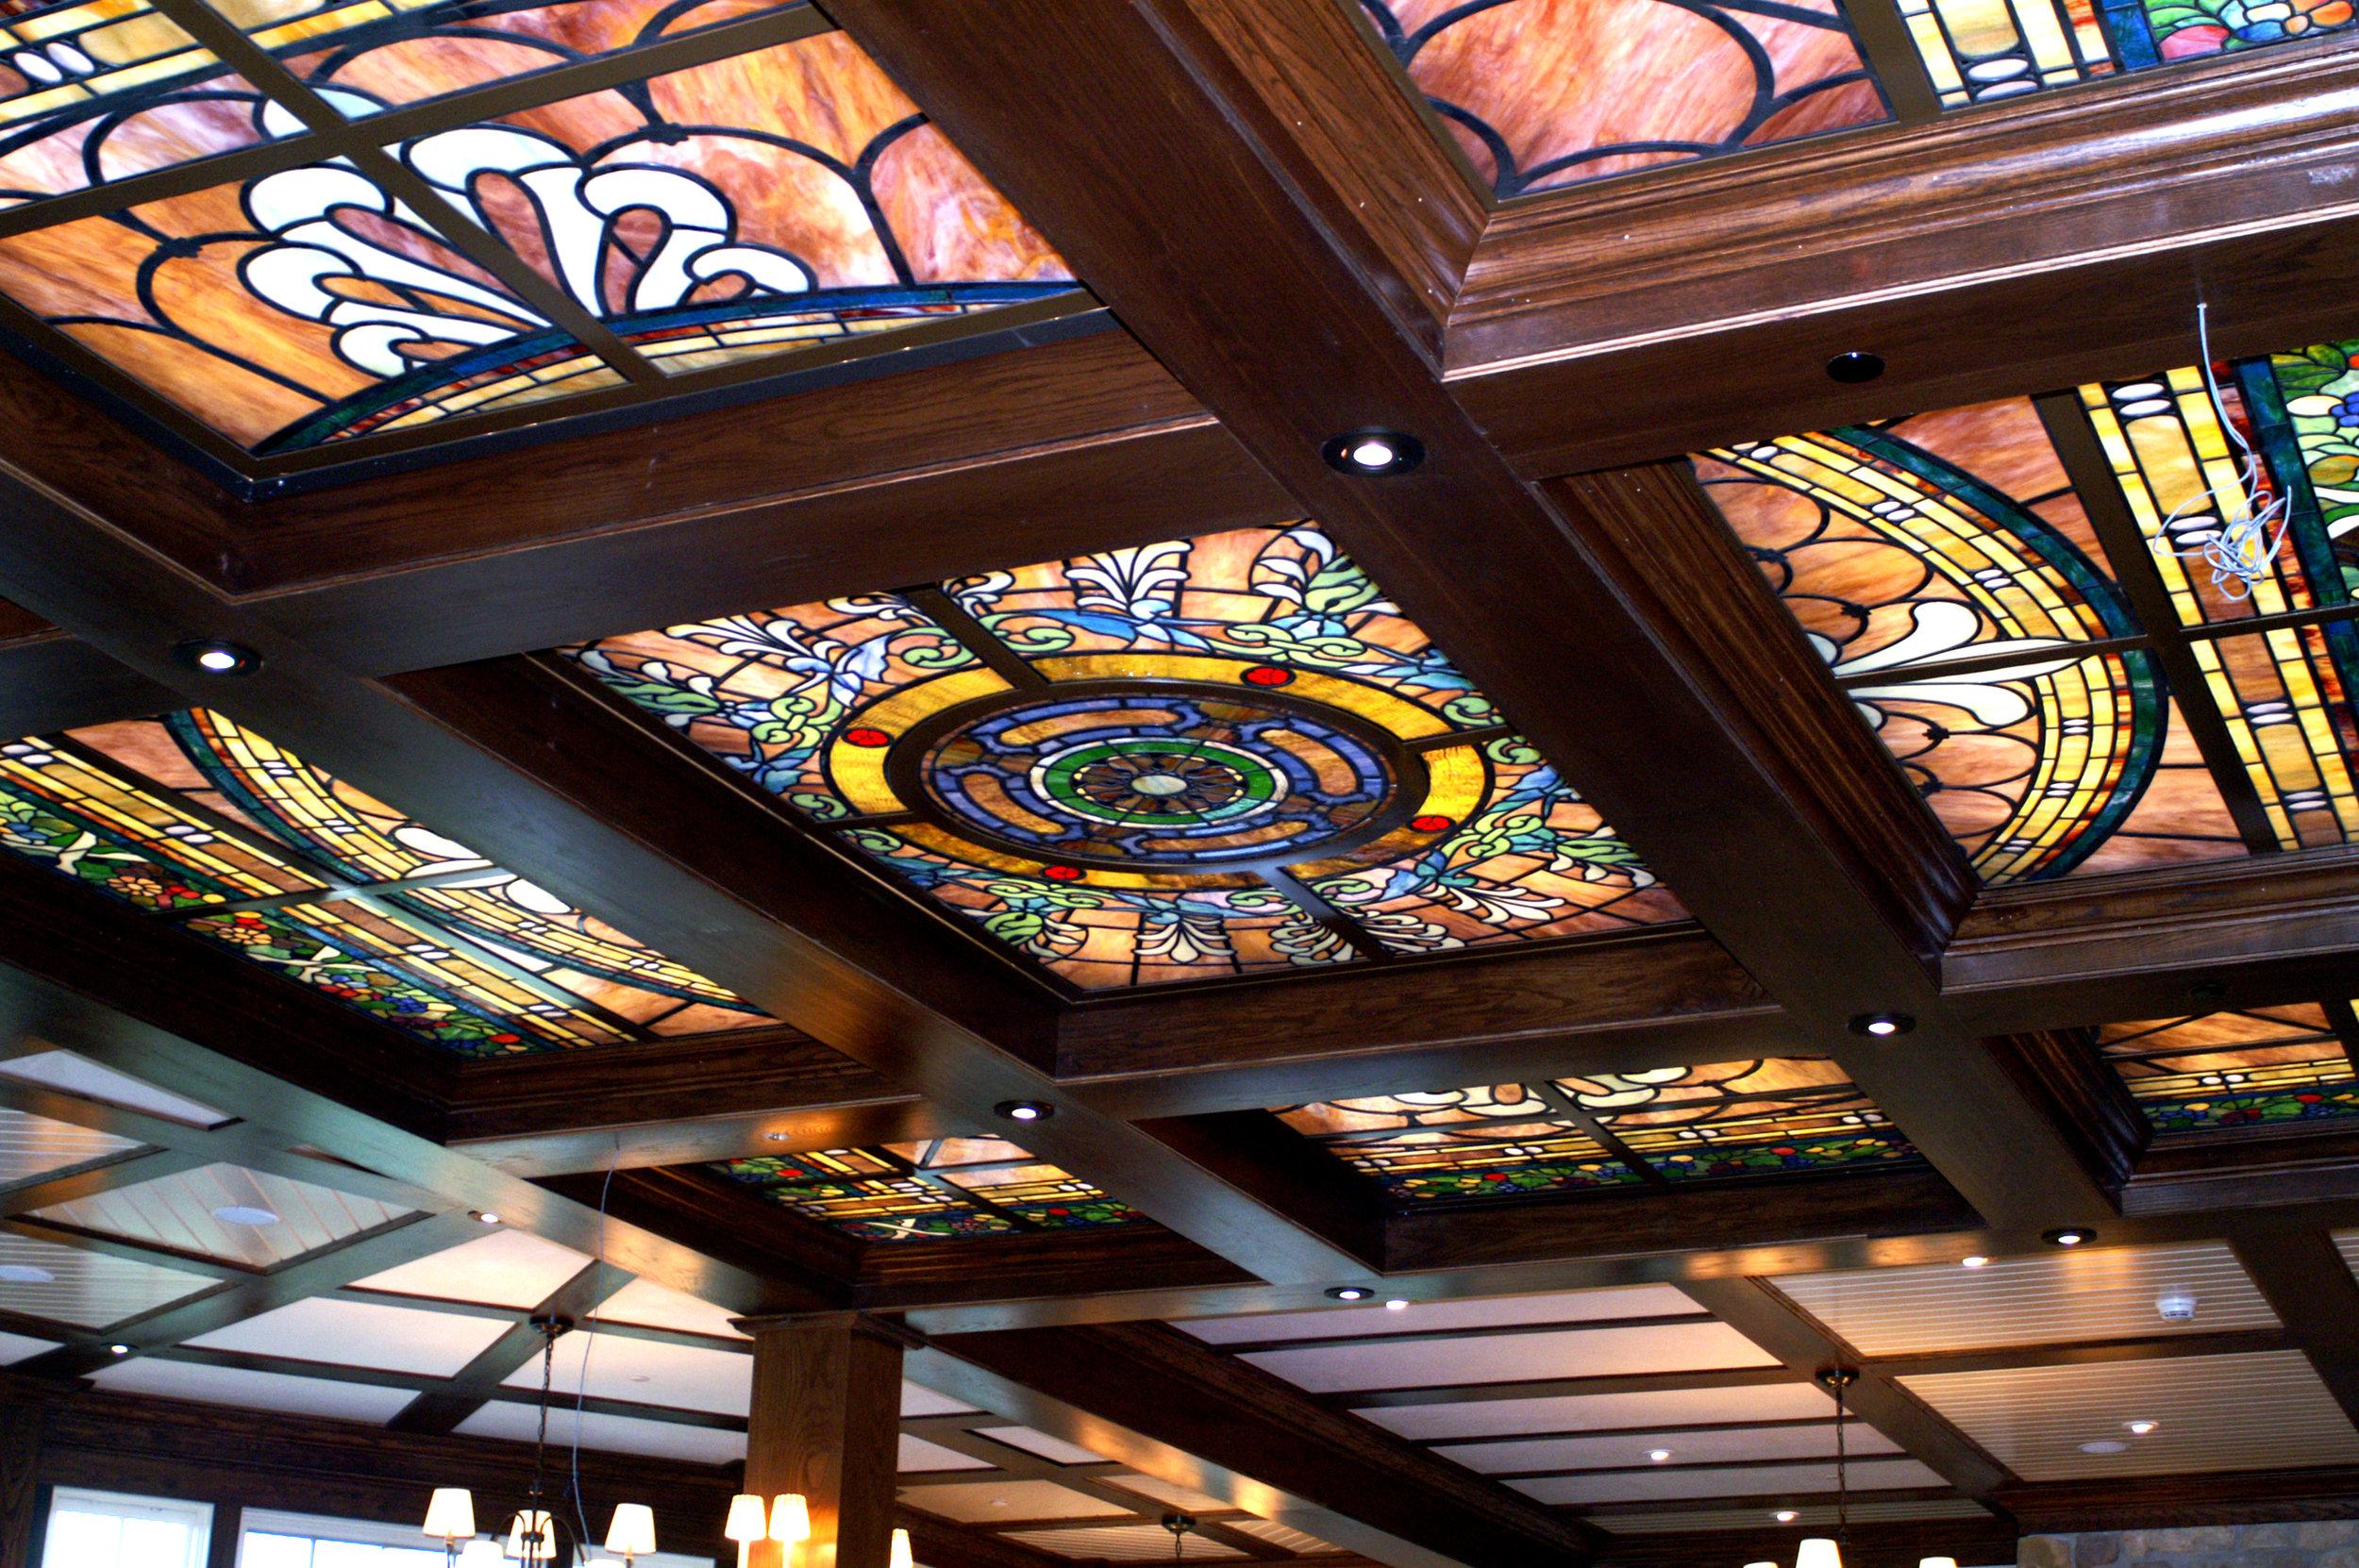 Hershey Entertainment & Resort Co. Dining Room, Hershey, PA